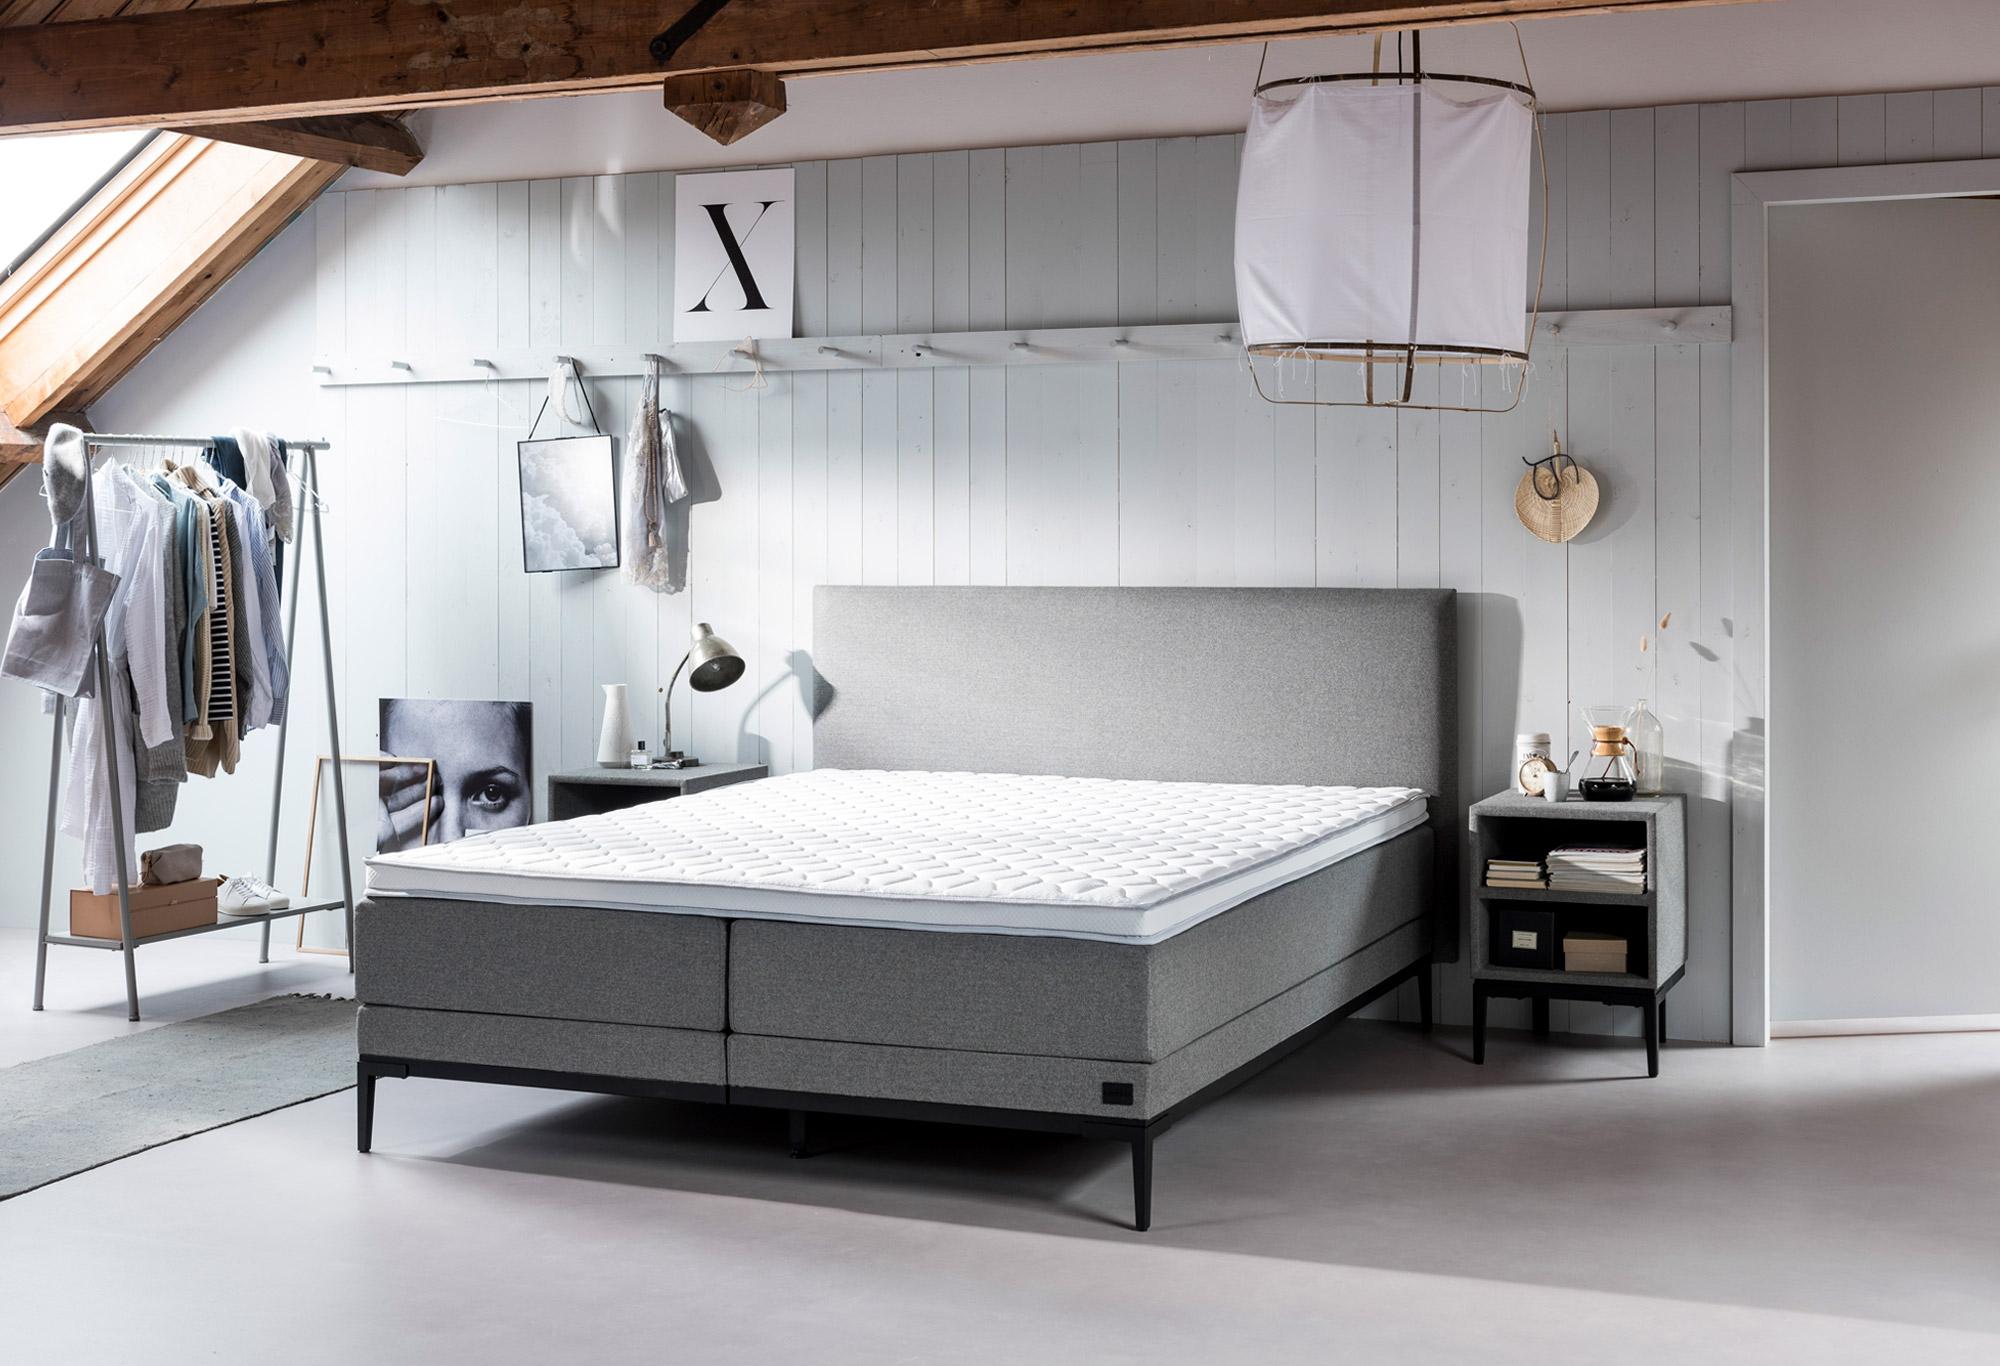 boxspringbett lifestyle thyme swiss sense. Black Bedroom Furniture Sets. Home Design Ideas